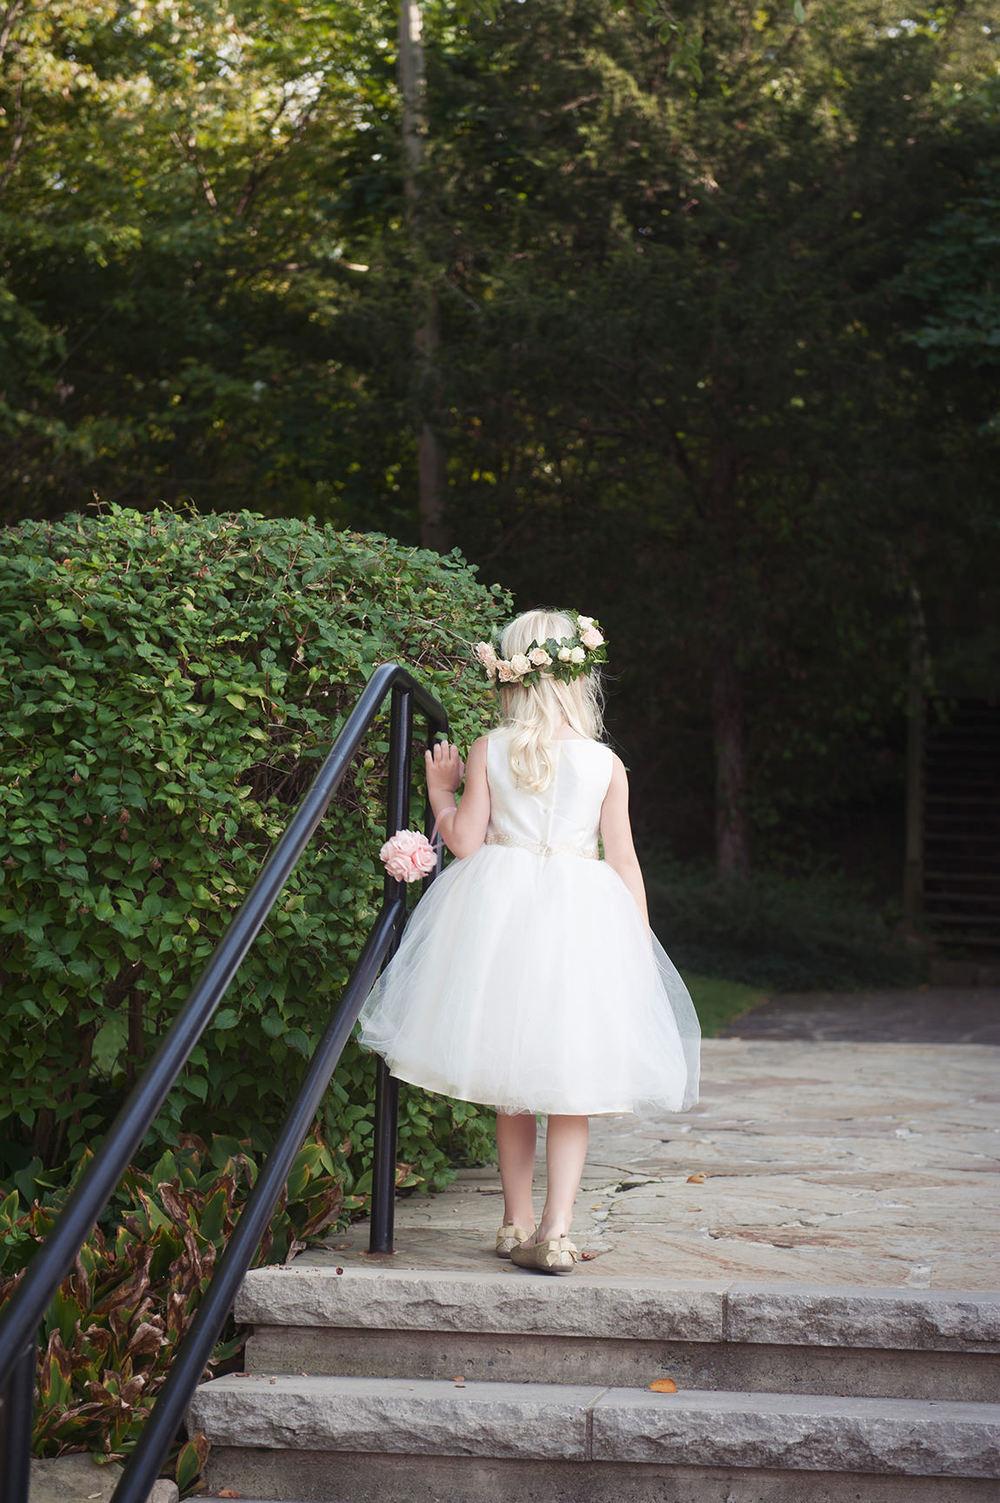 St-Catharines-Wedding-Stone-Mill-Inn-Amy-Darryl-photography-by-Morgan-Falk-035.JPG